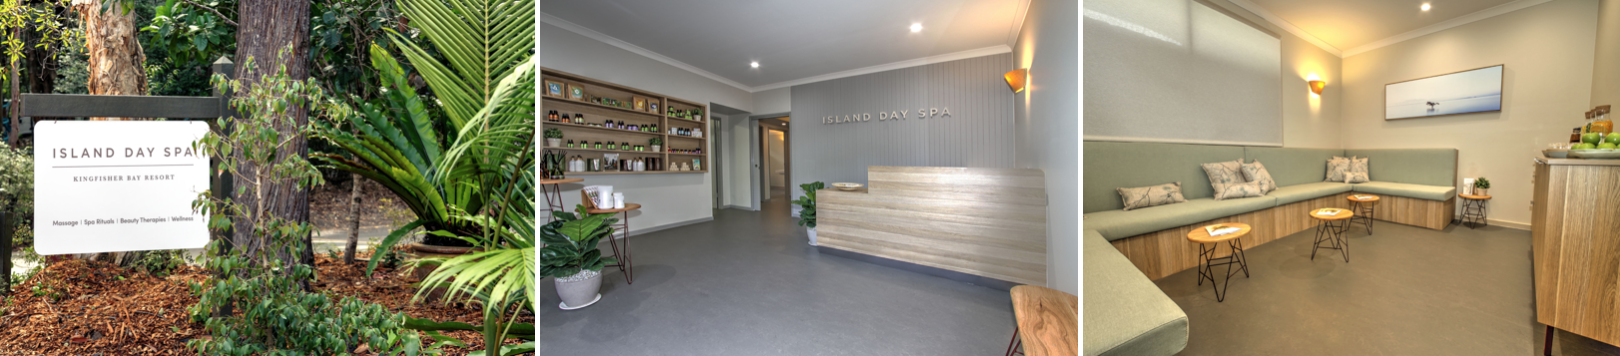 Island Day Spa Designs by Spa Wellness Consulting Australia.jpg